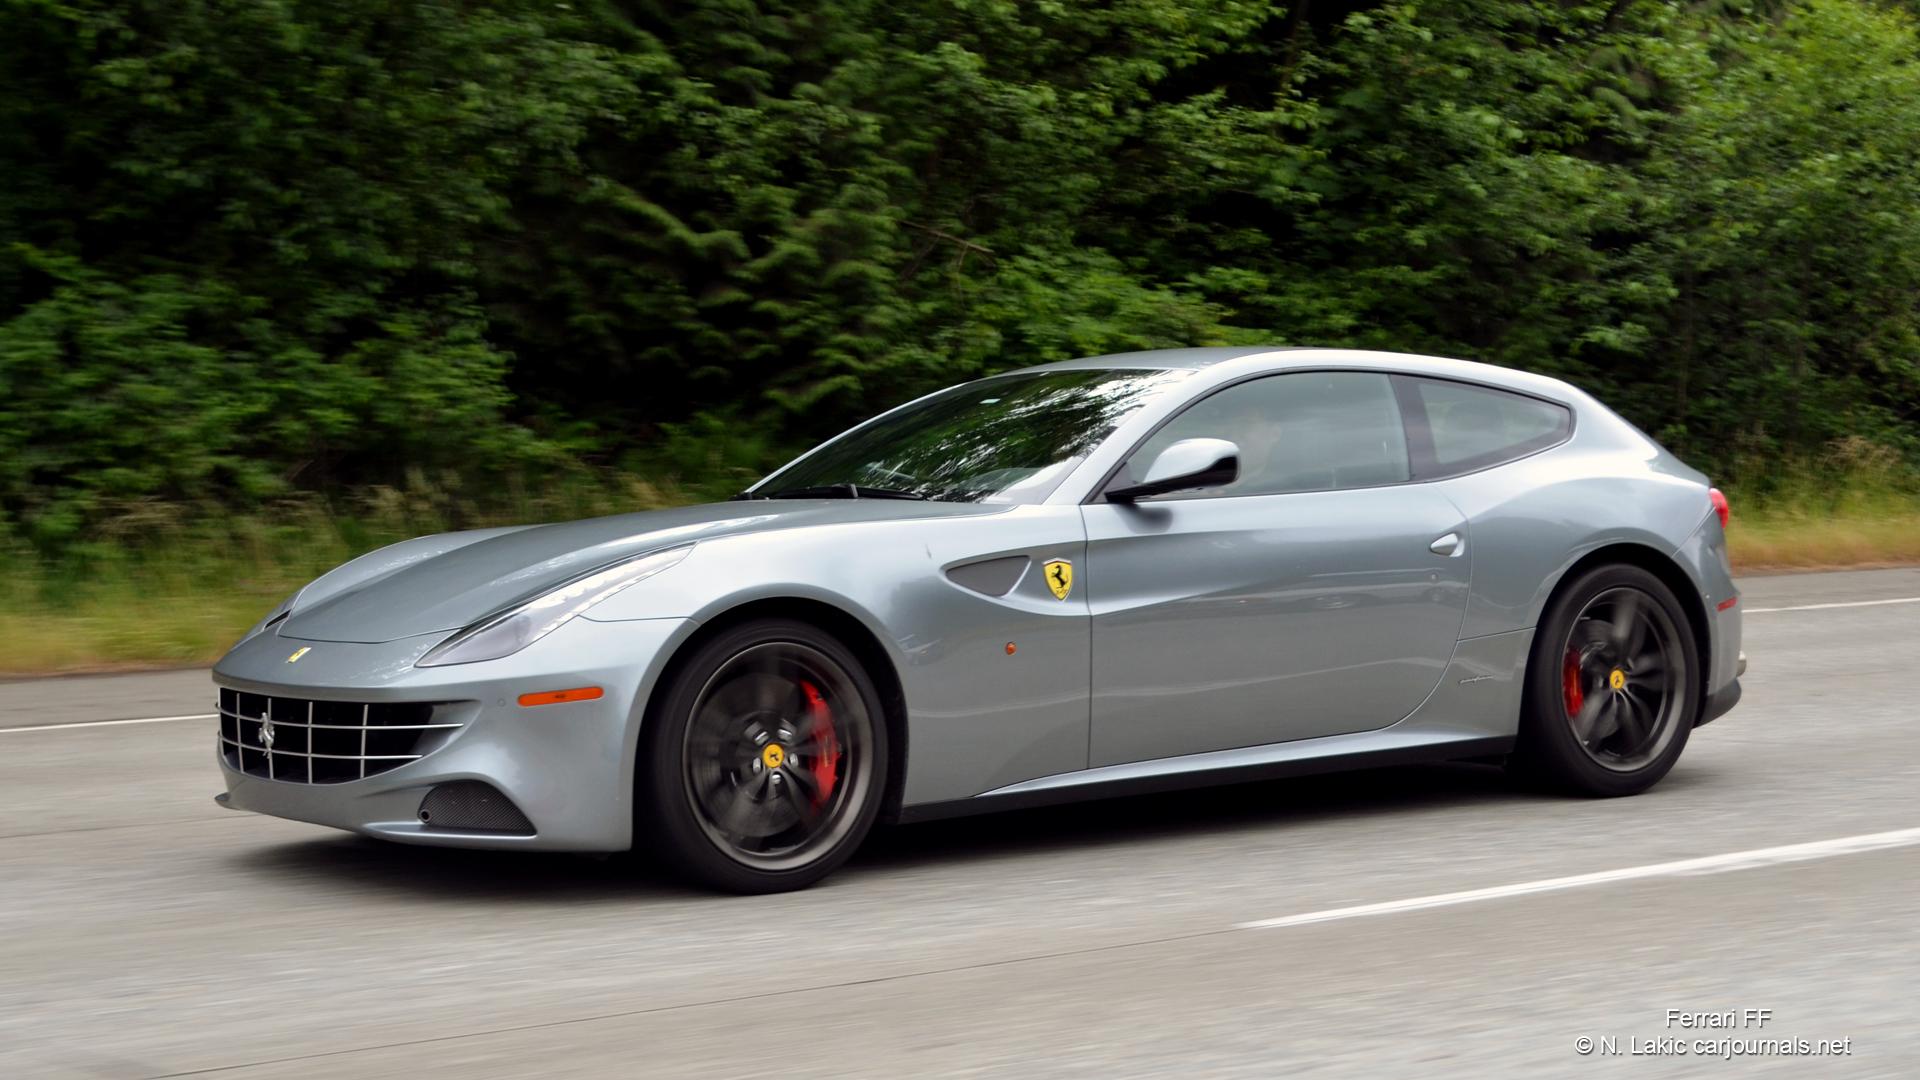 Hd Car Wallpapers Gray Ferrari Ff Car Journals